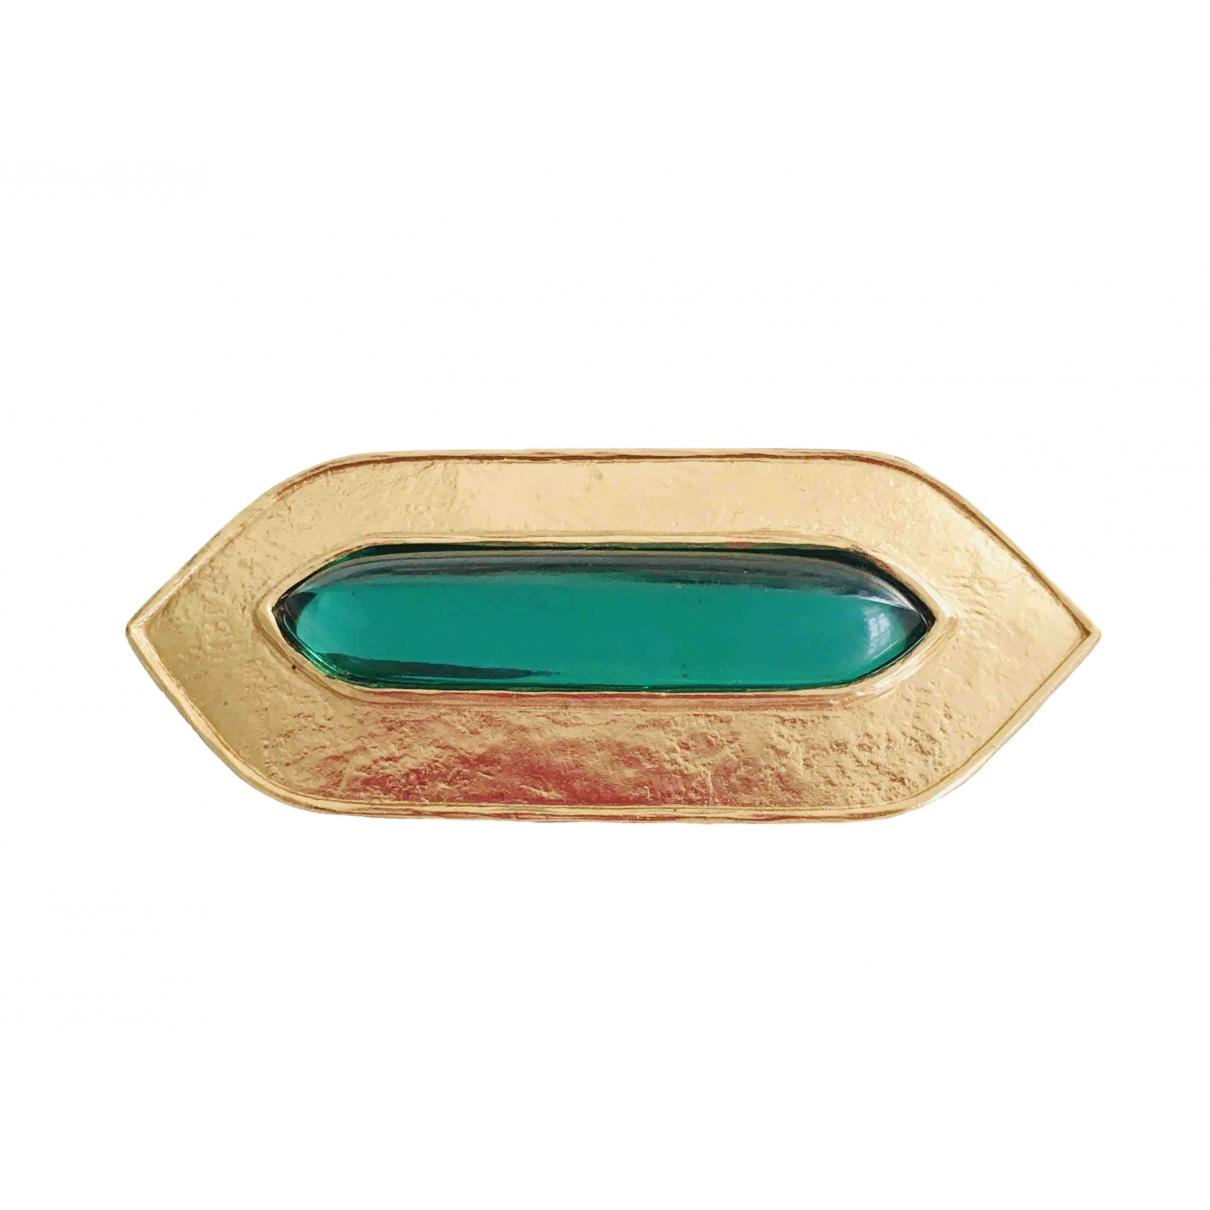 Jean-louis Scherrer \N Brosche in  Gold Metall